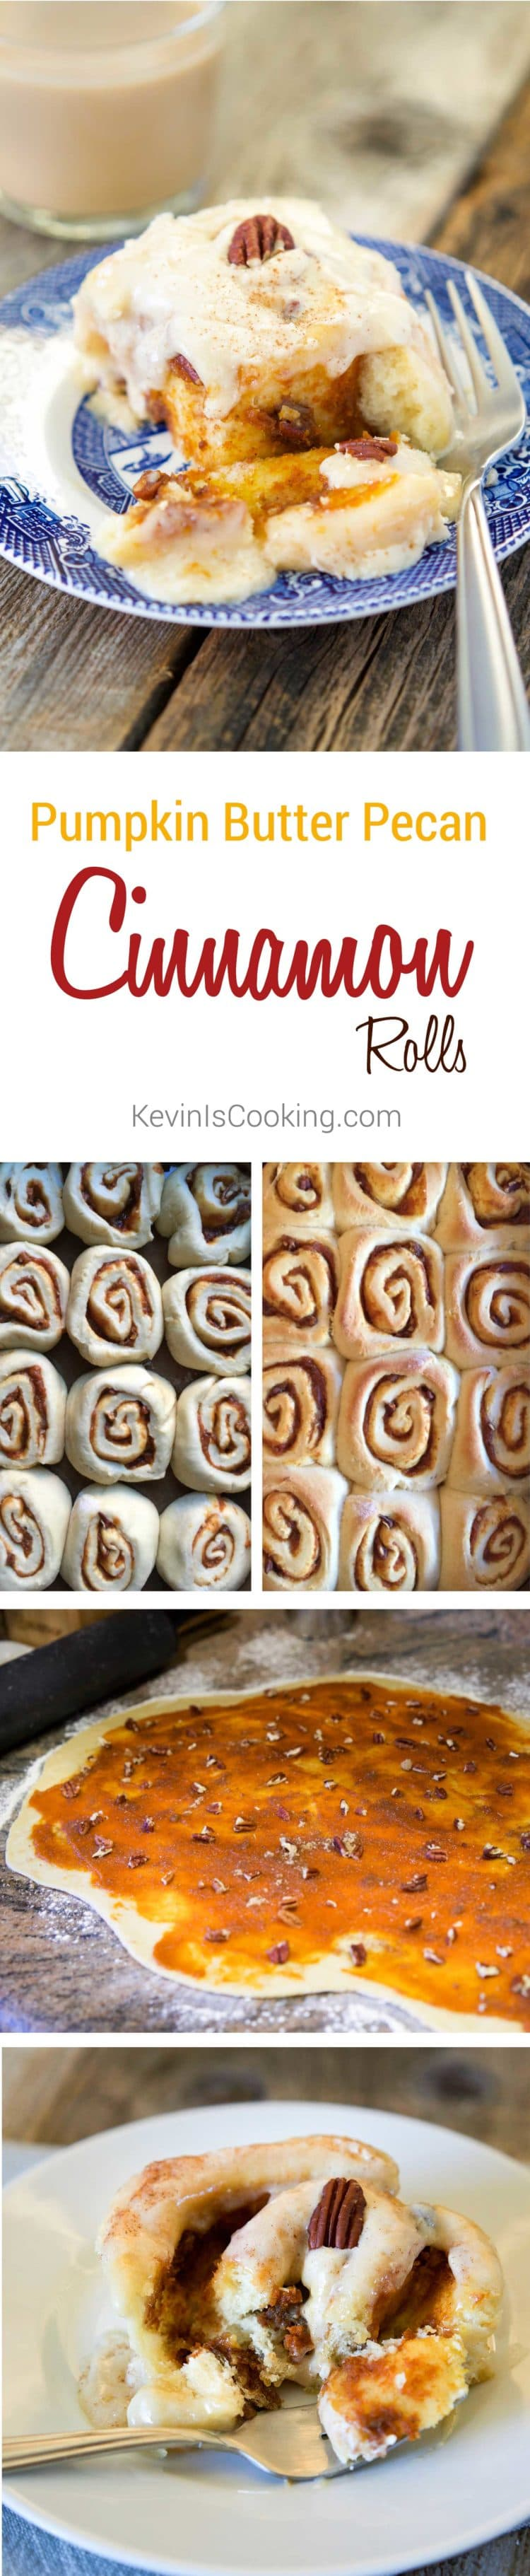 Pumpkin Butter Pecan Cinnamon Rolls. www.keviniscooking.com